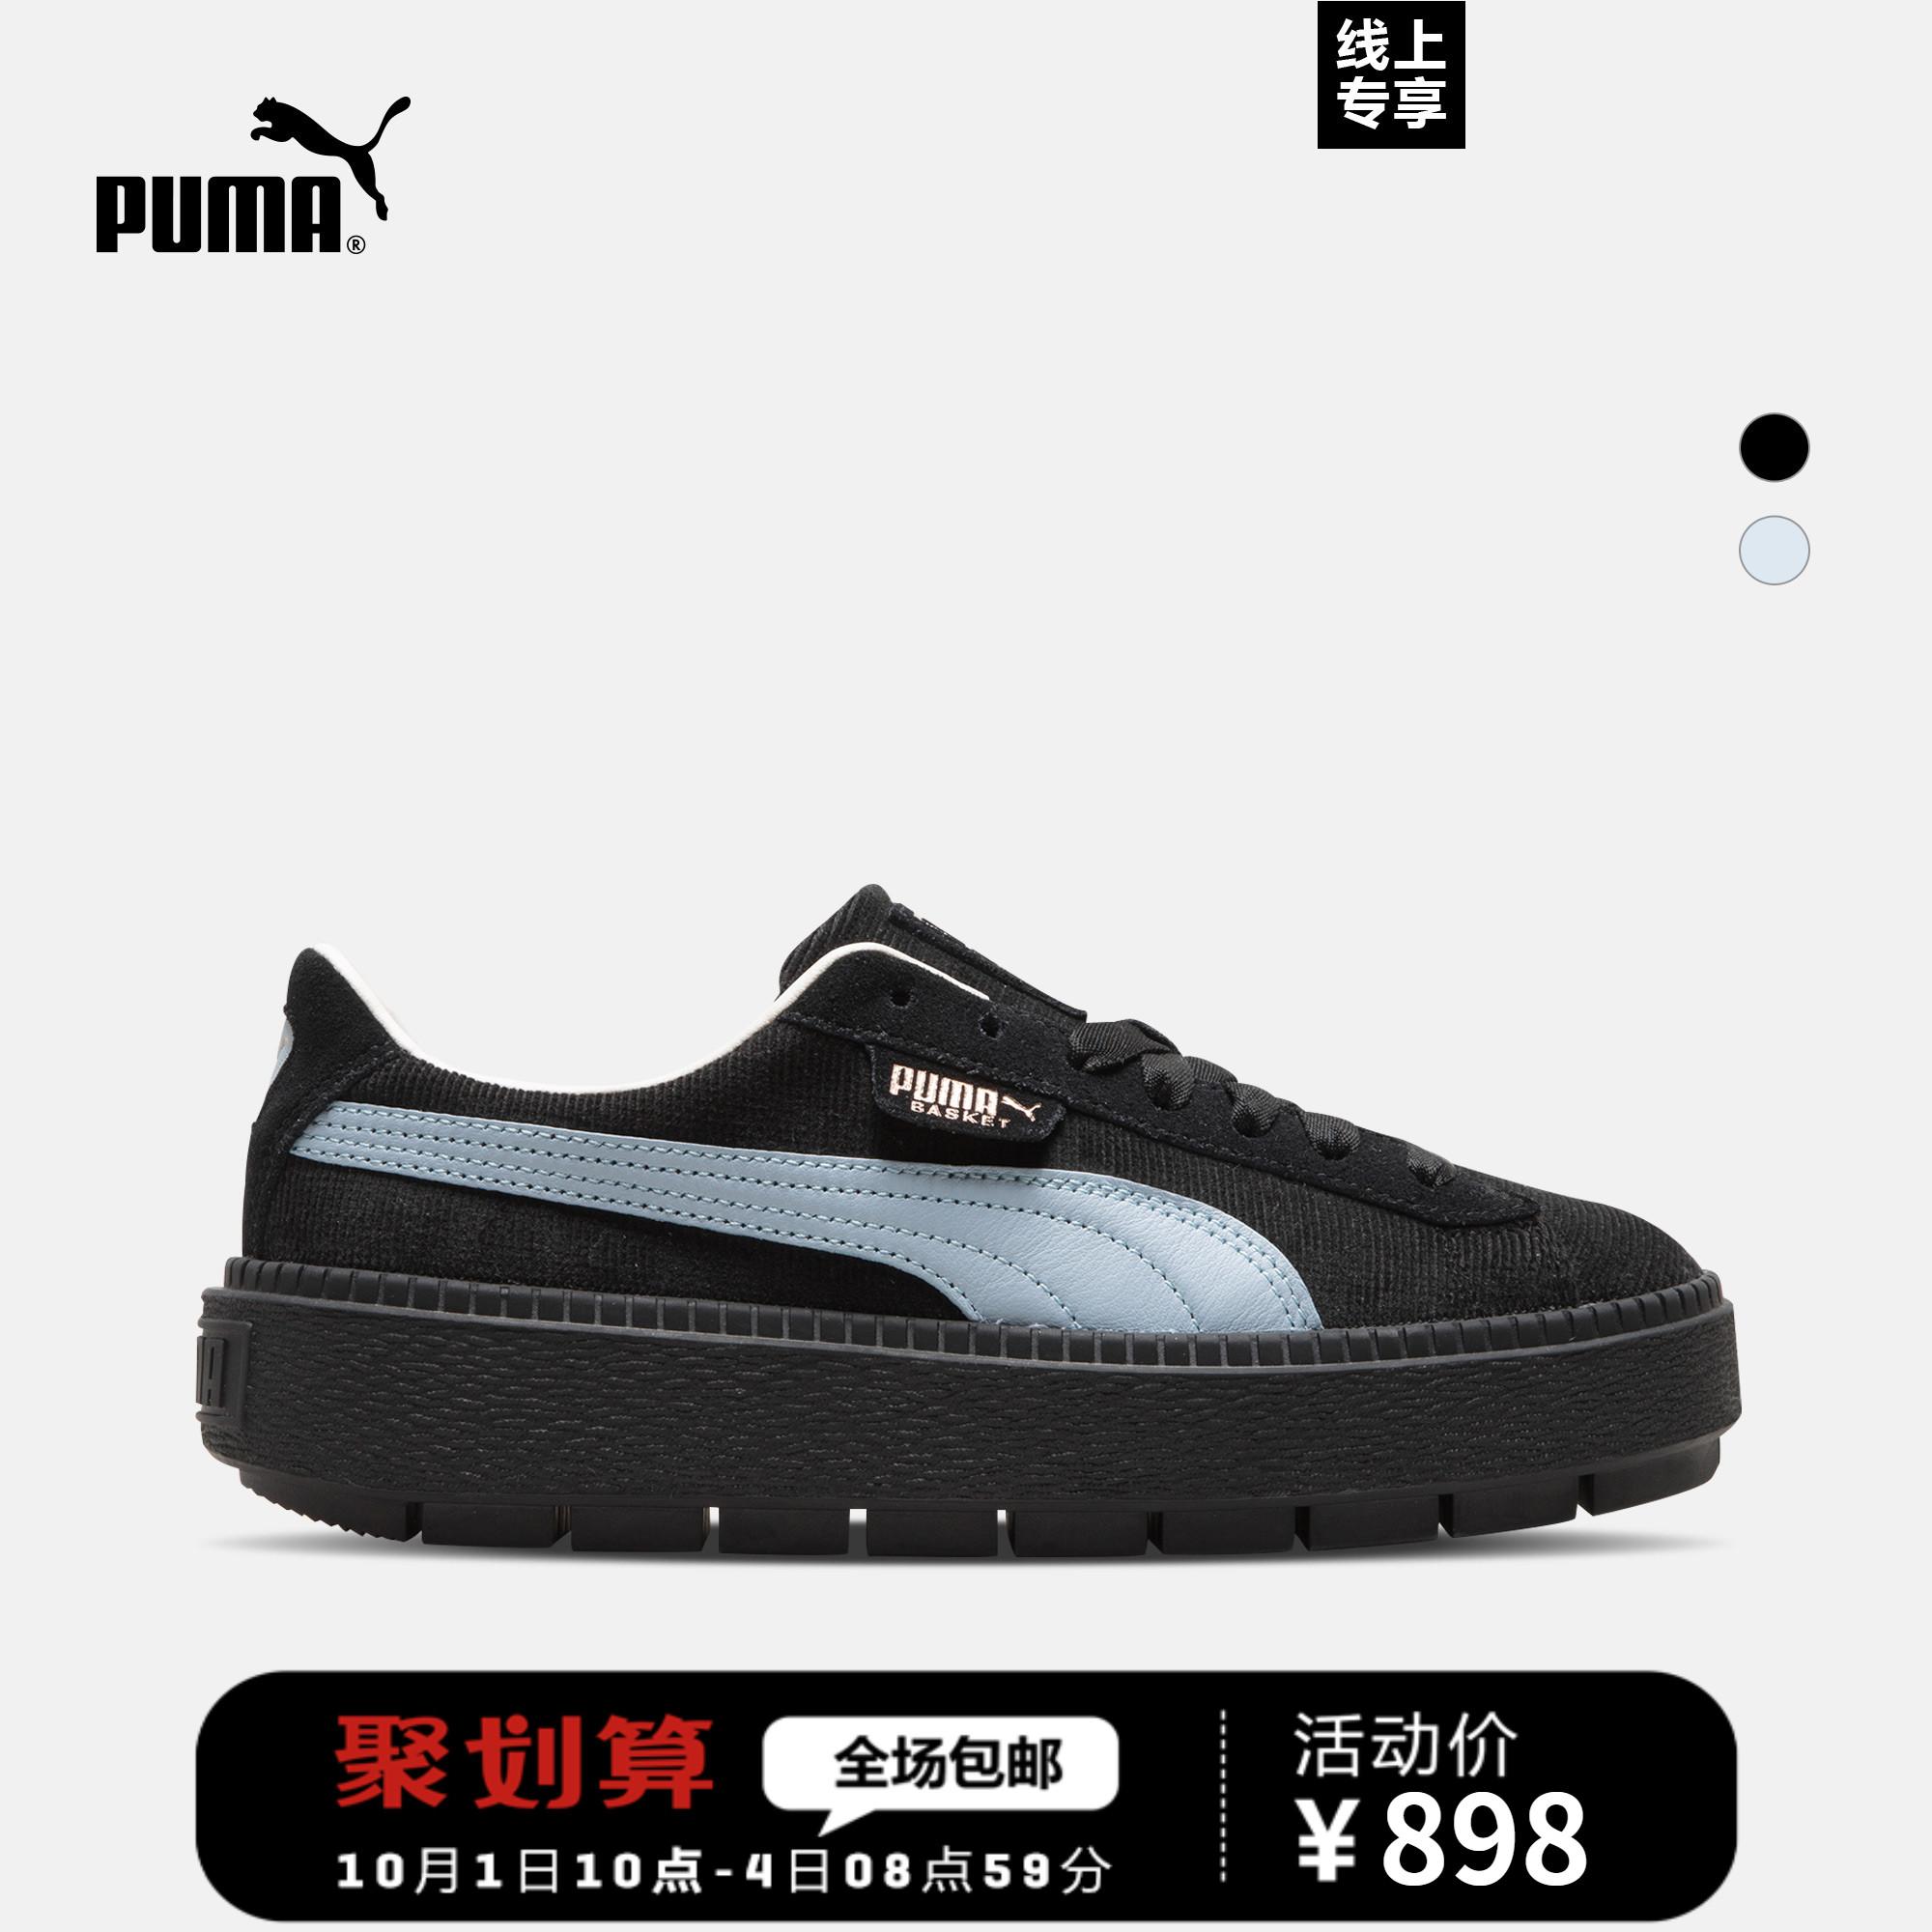 PUMA彪马官方 女子拼色厚底休闲鞋Trace366977